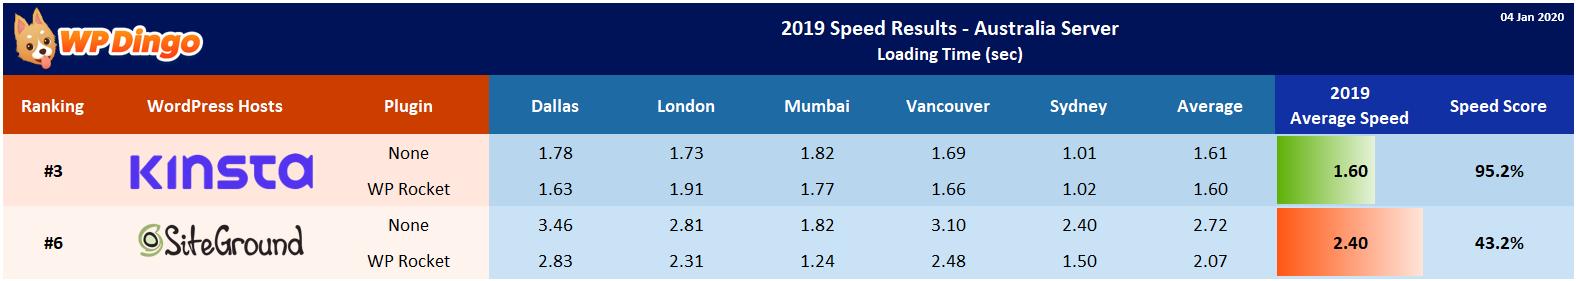 2019 Kinsta vs SiteGround Speed Table - Australia Server